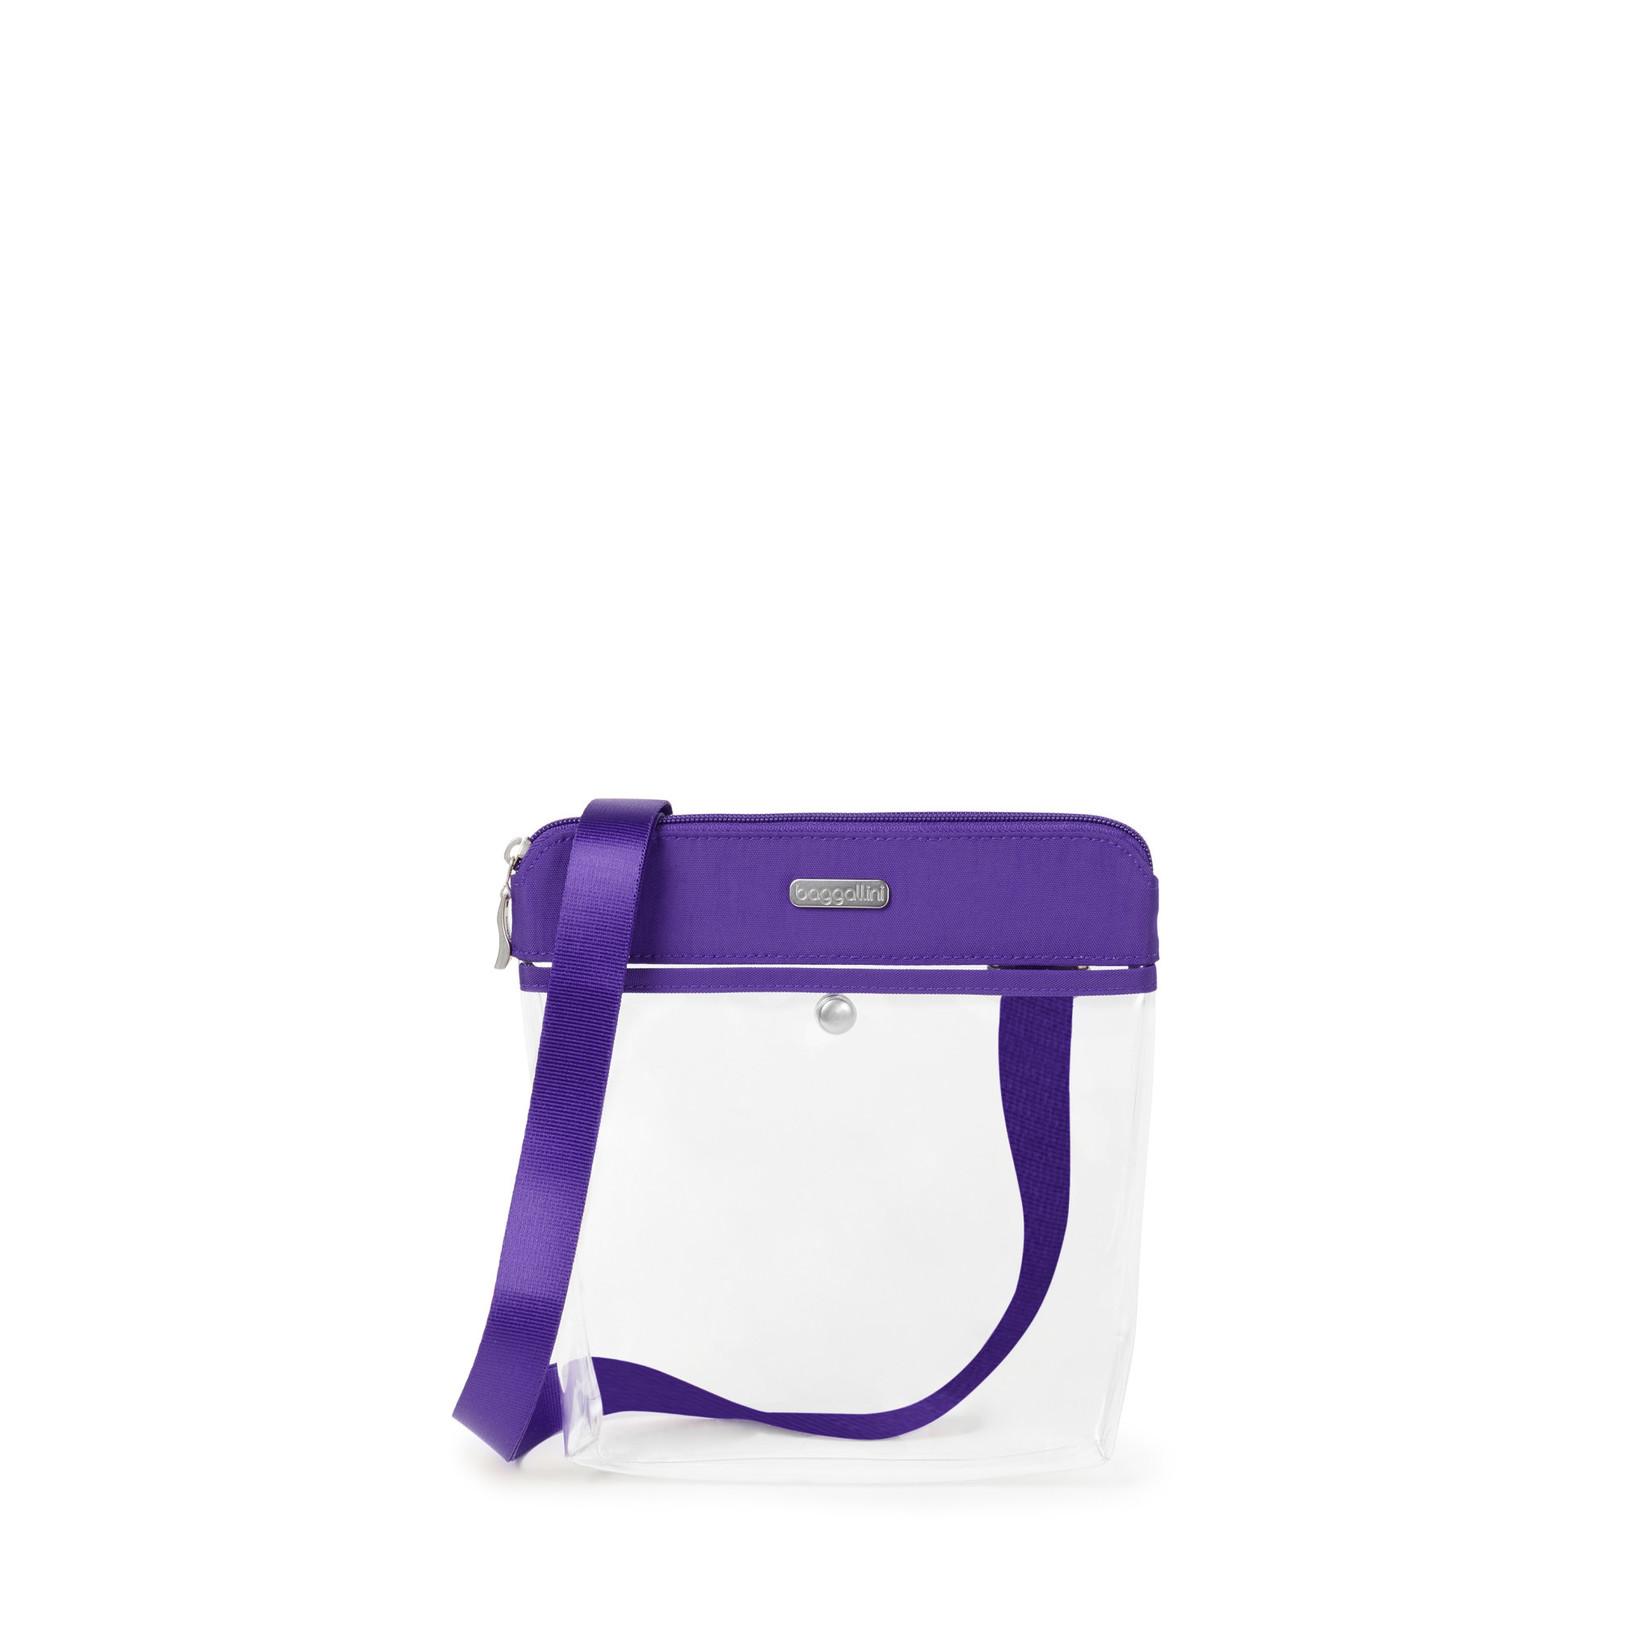 Baggallini Clear Event Compliant Pocket Crossbody - Royal Purple